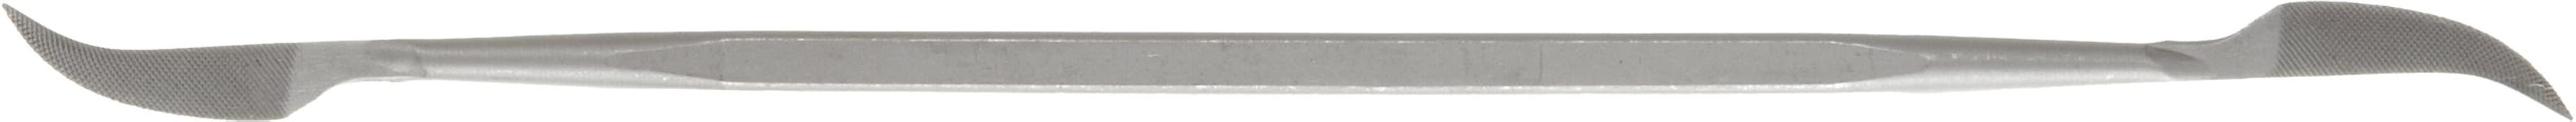 nicholson riffler files